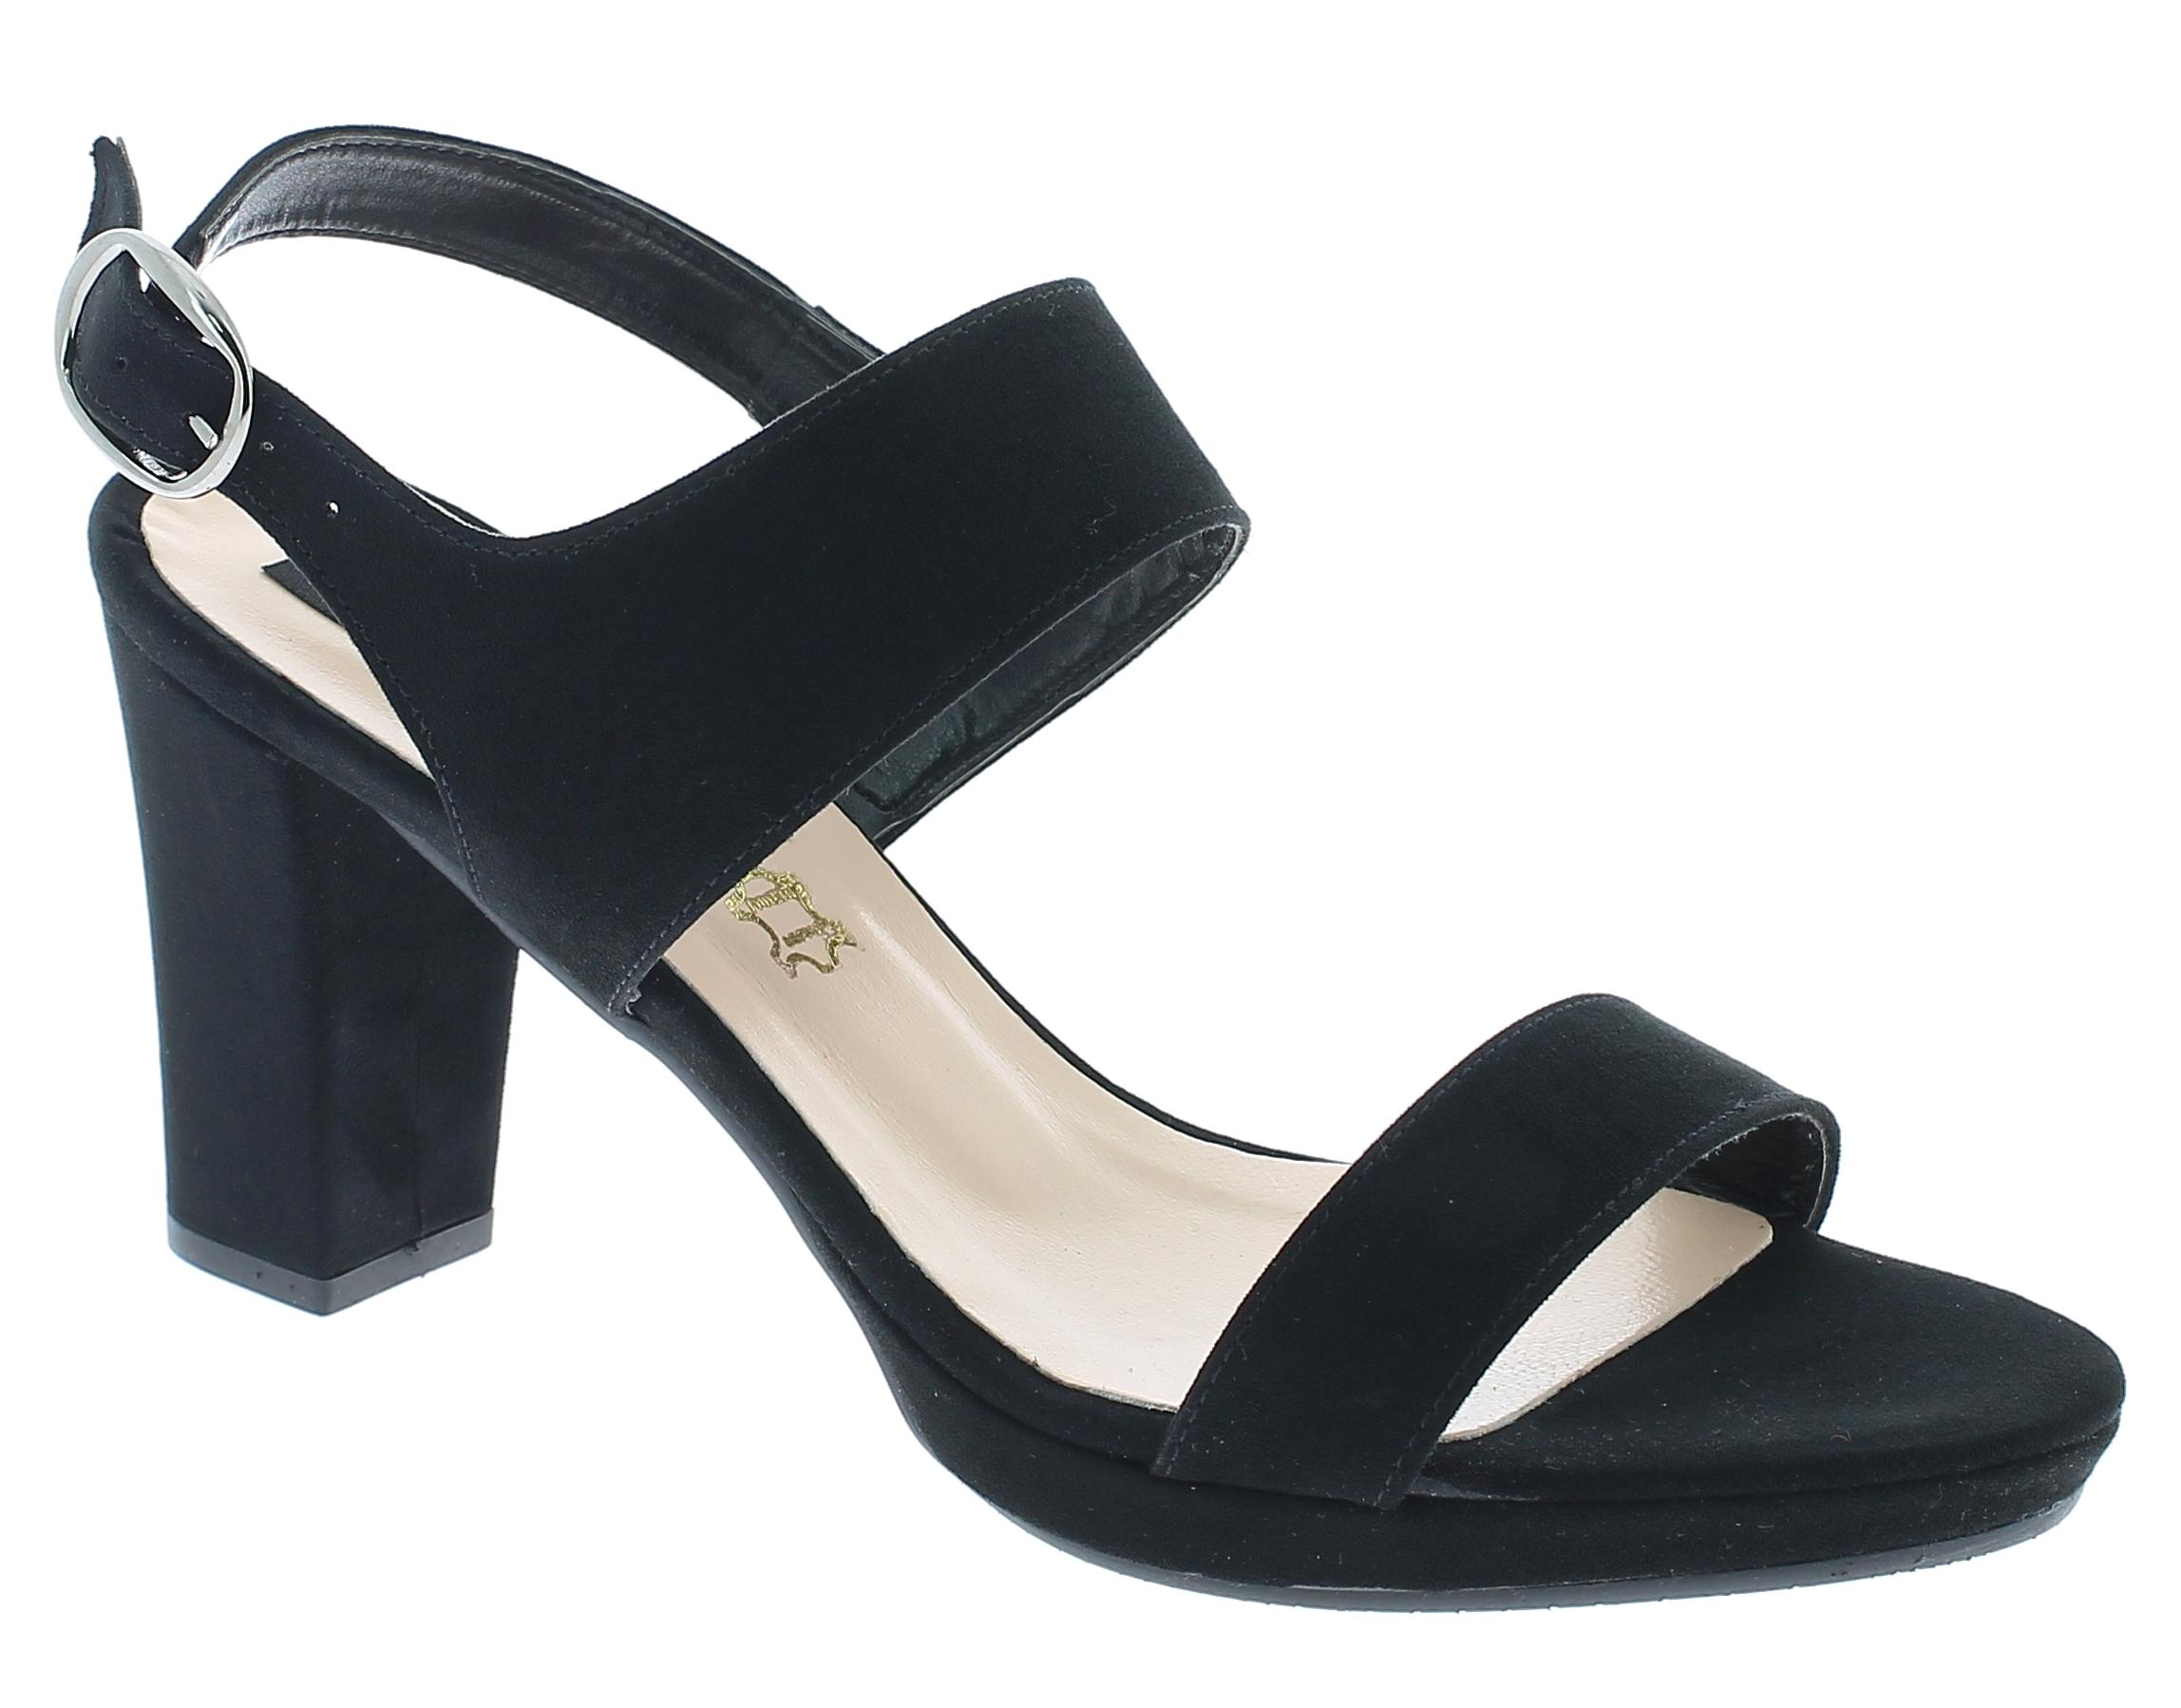 IQSHOES Γυναικείο Πέδιλο 376 Μαύρο - IqShoes - 41.376 BLACK -black-36/1/15/7 παπούτσια  πέδιλα